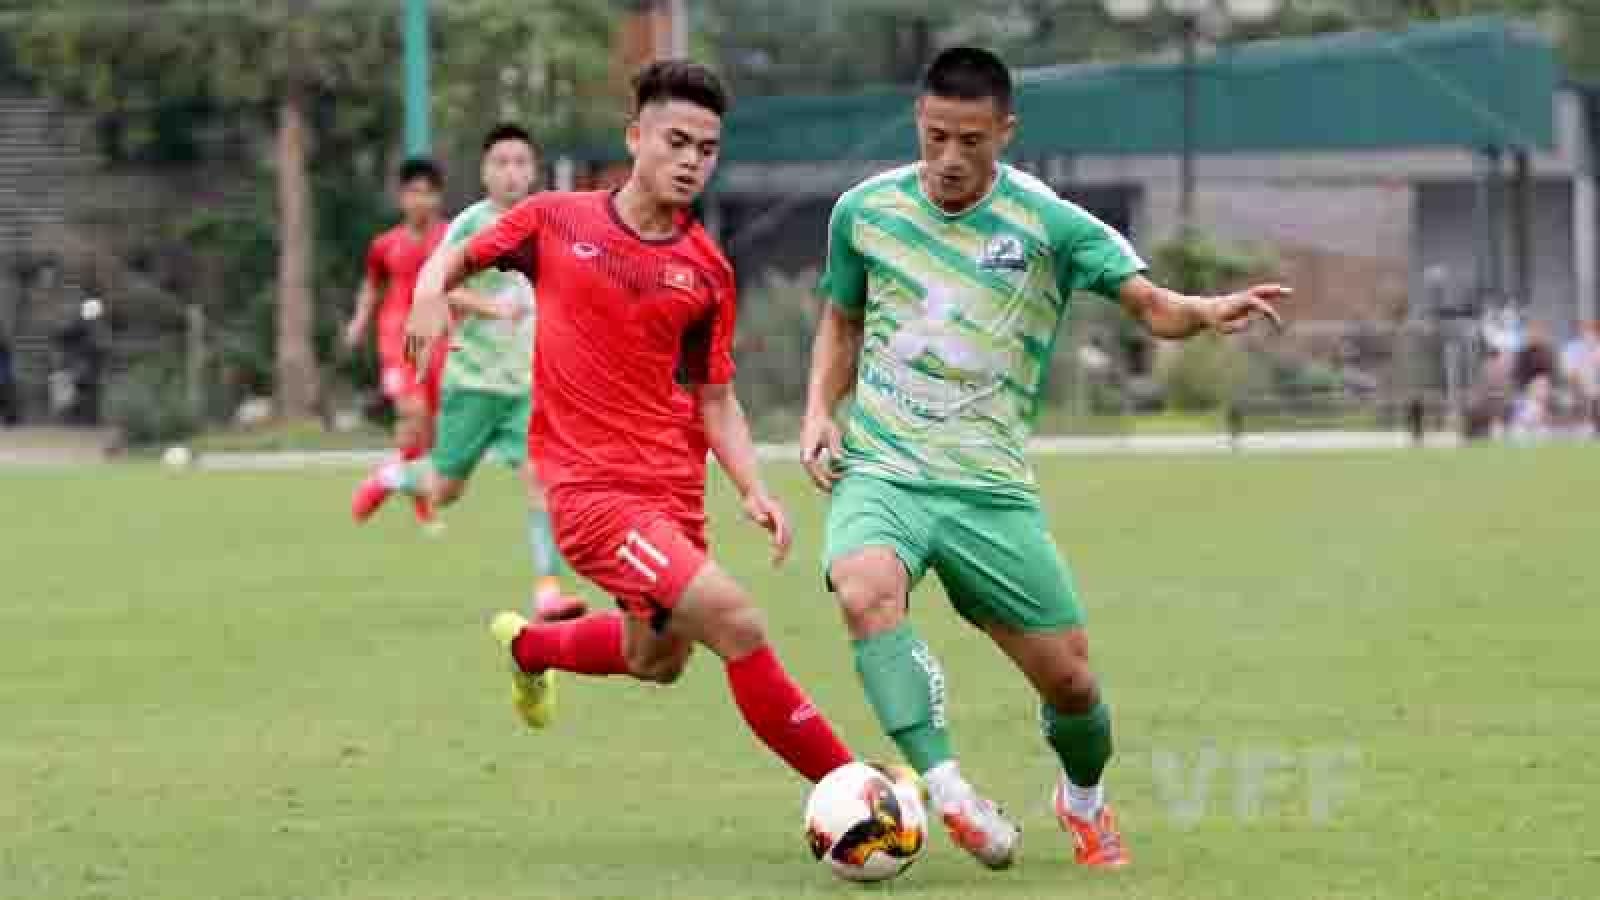 Vietnam U18 squad train hard ahead of upcoming international tournaments